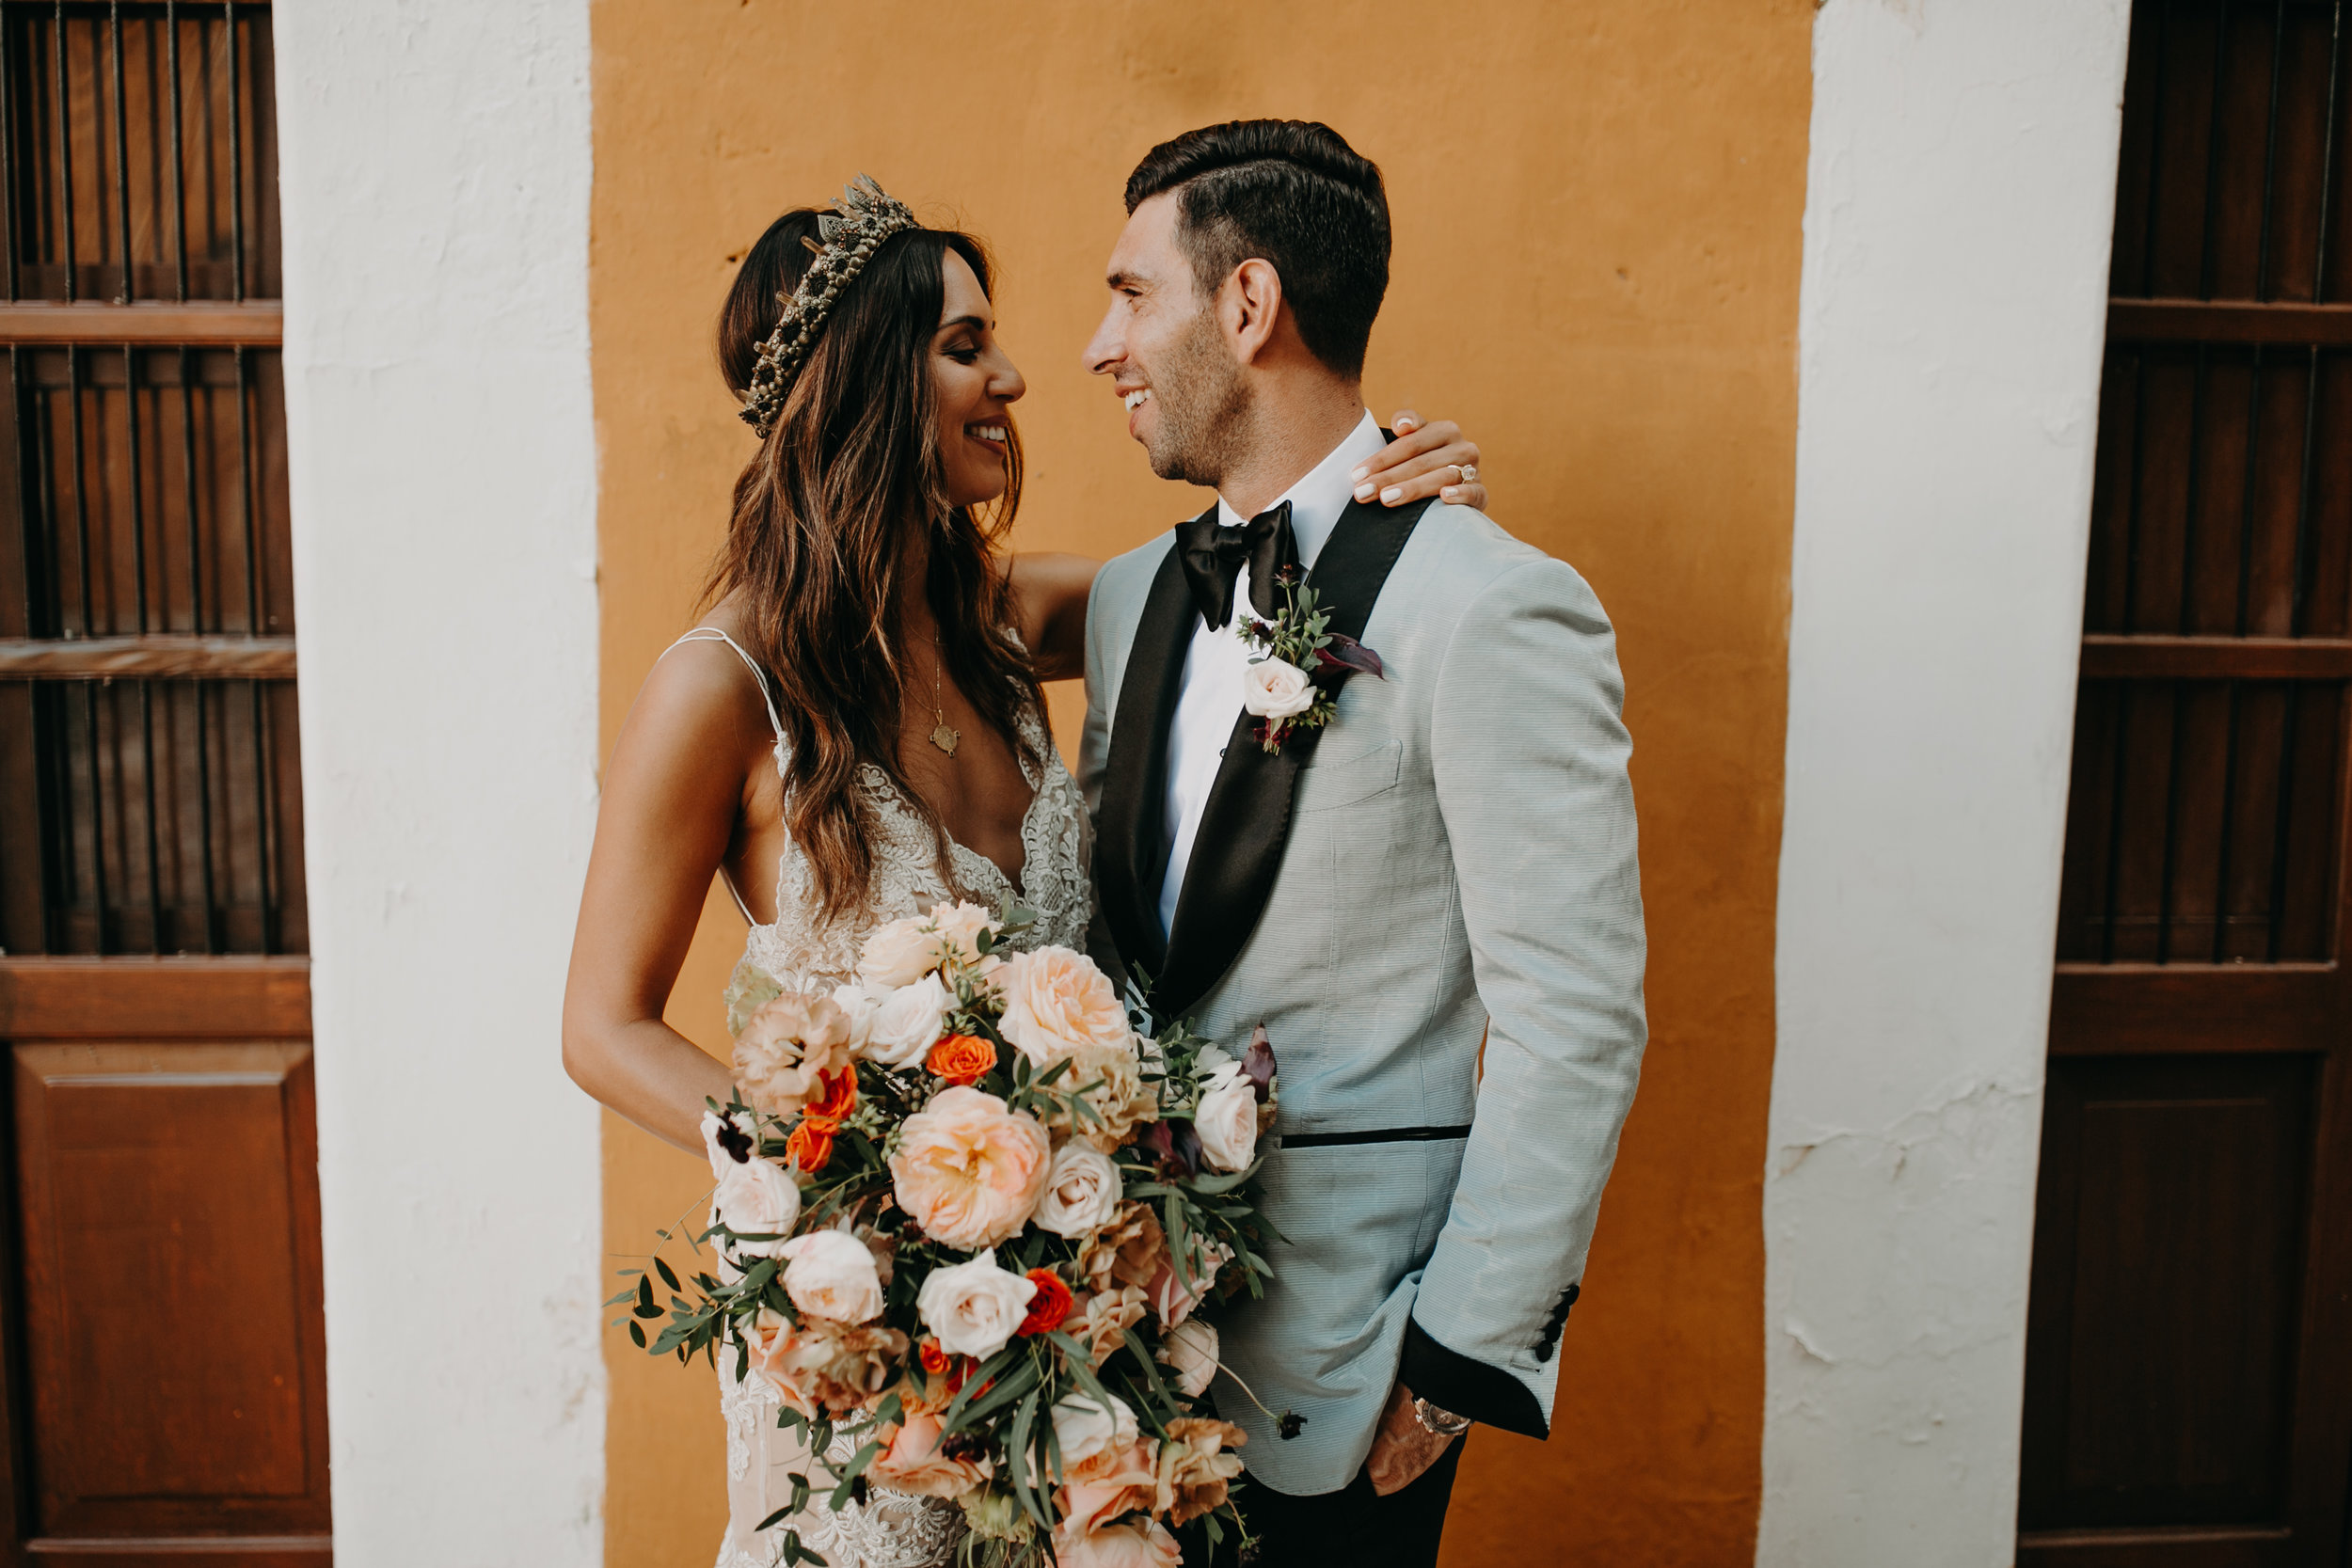 Hacienda Temozon Yucatan Mexico Wedding | Ida & Peter Emily Magers Photography-577.jpg